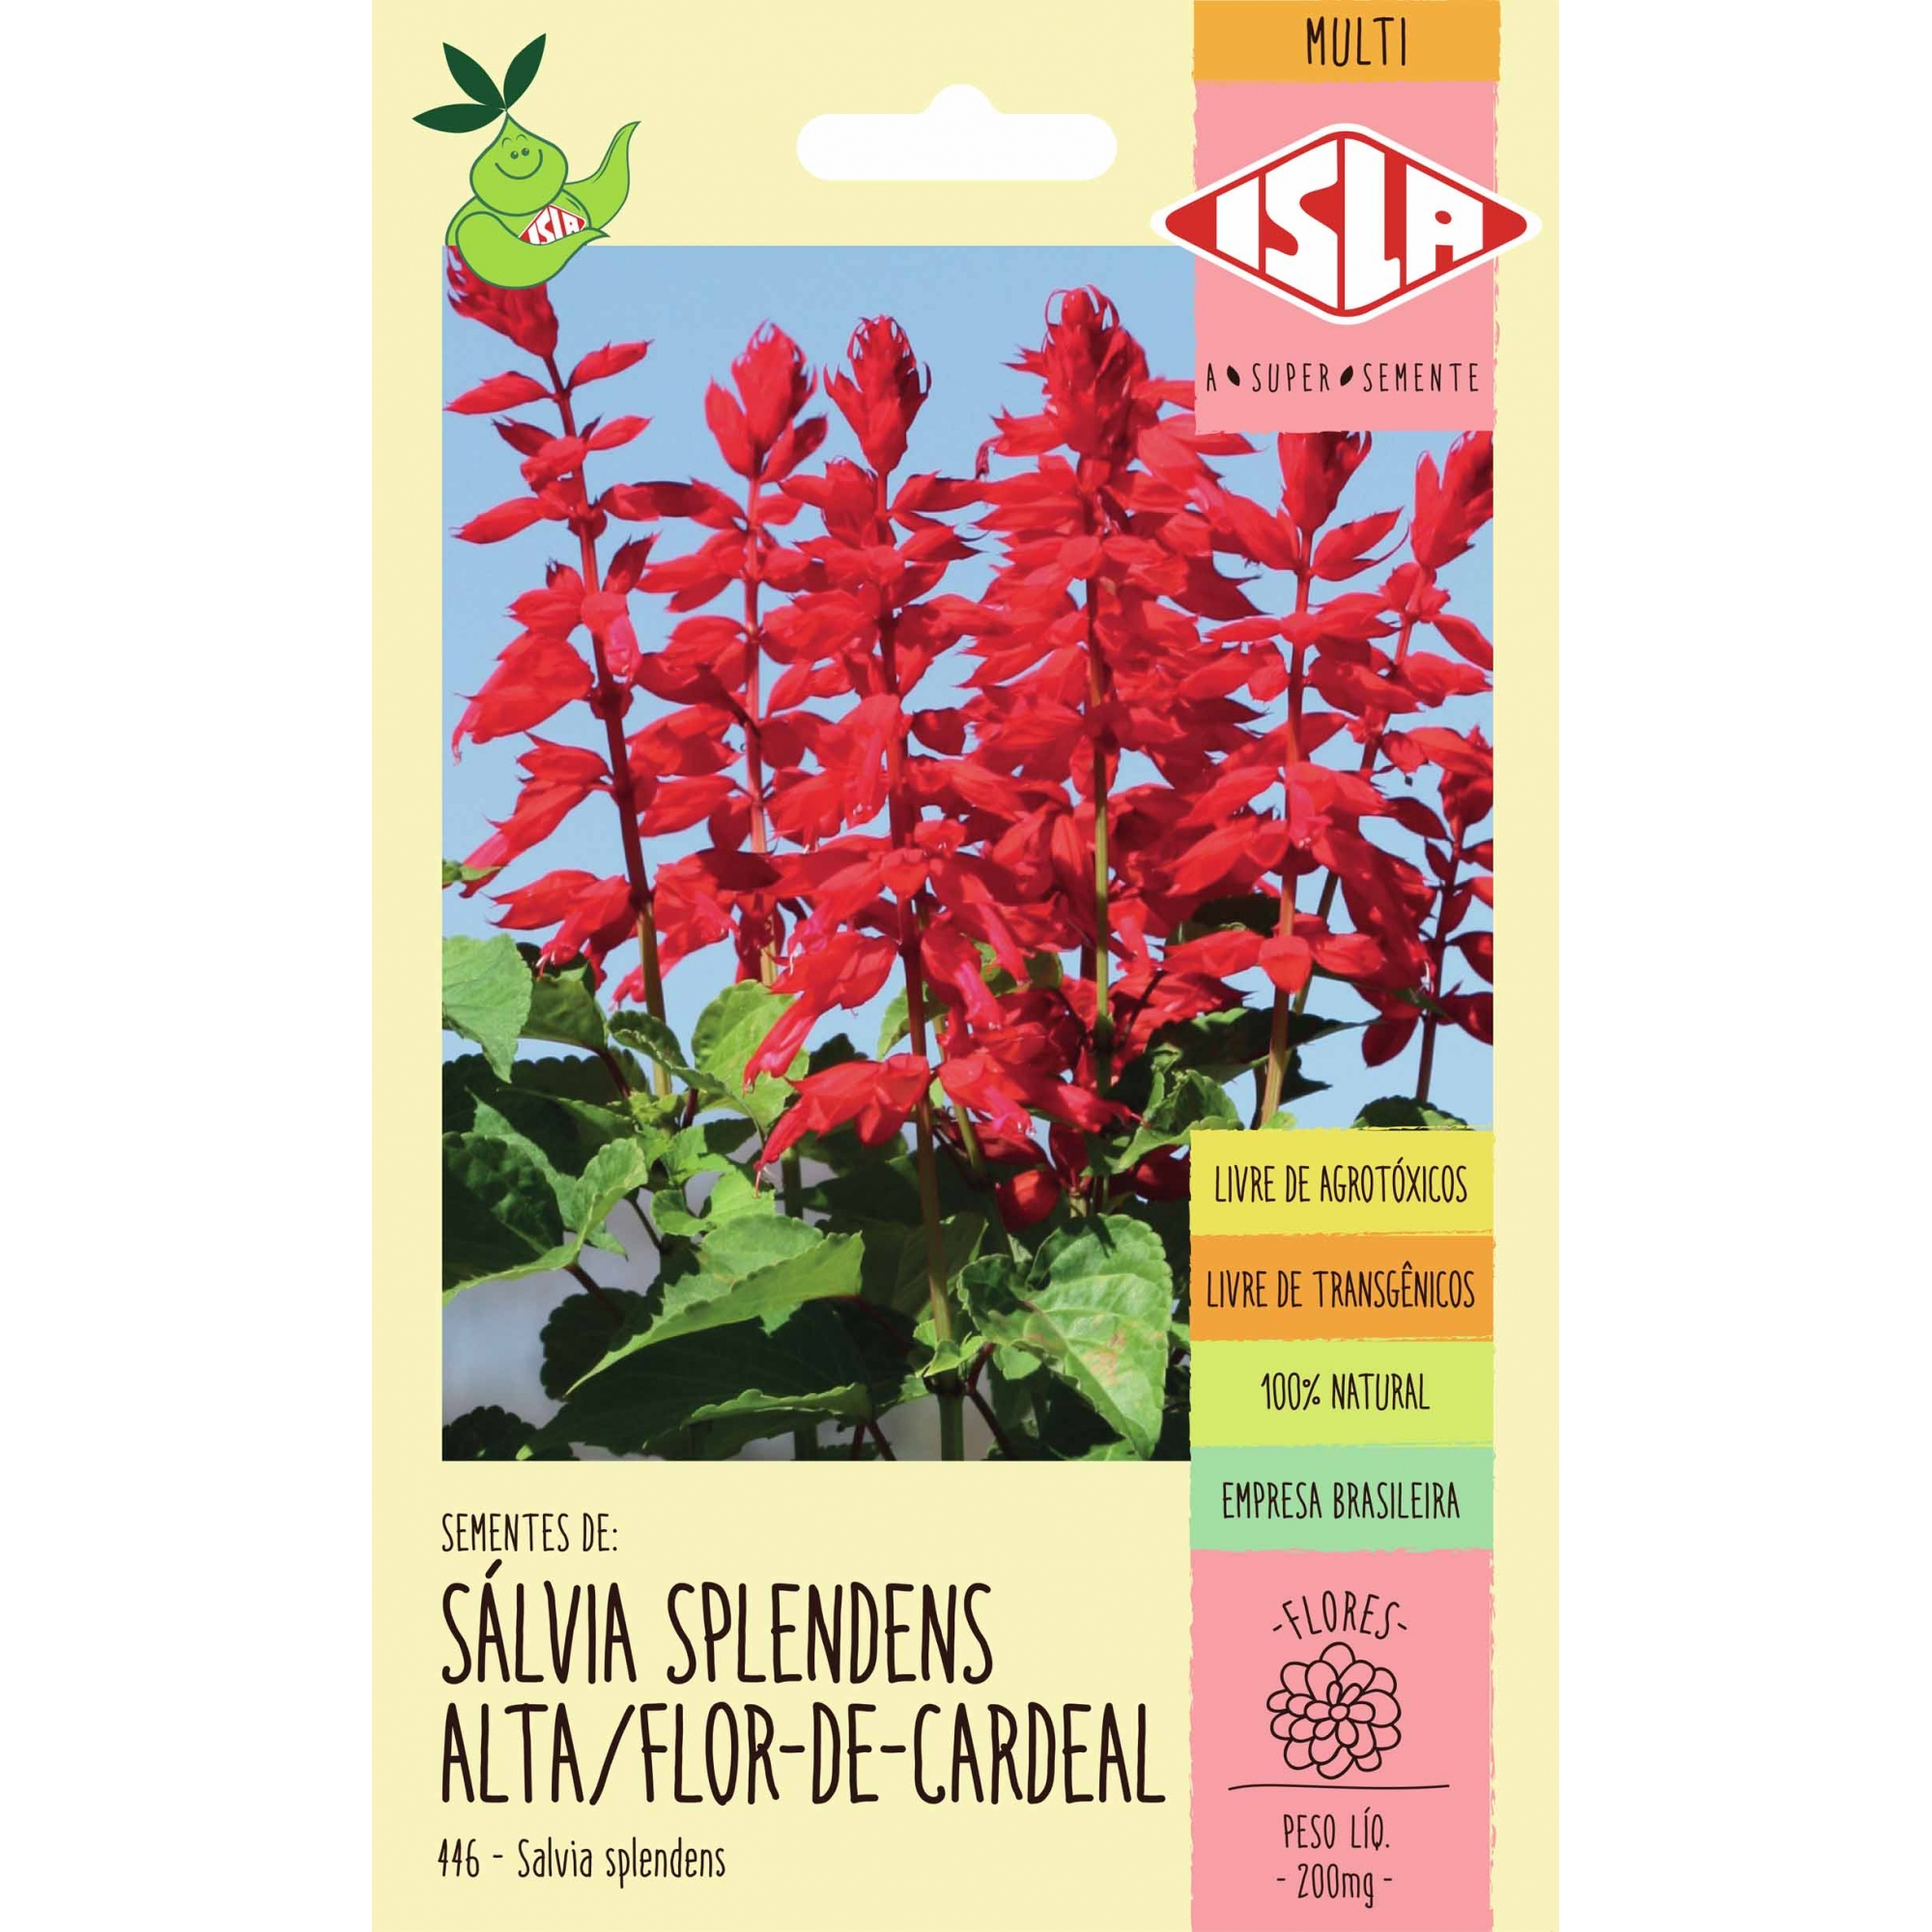 Sementes de Sálvia Splendens Alta Flor de Cardeal 200mg - Isla Multi